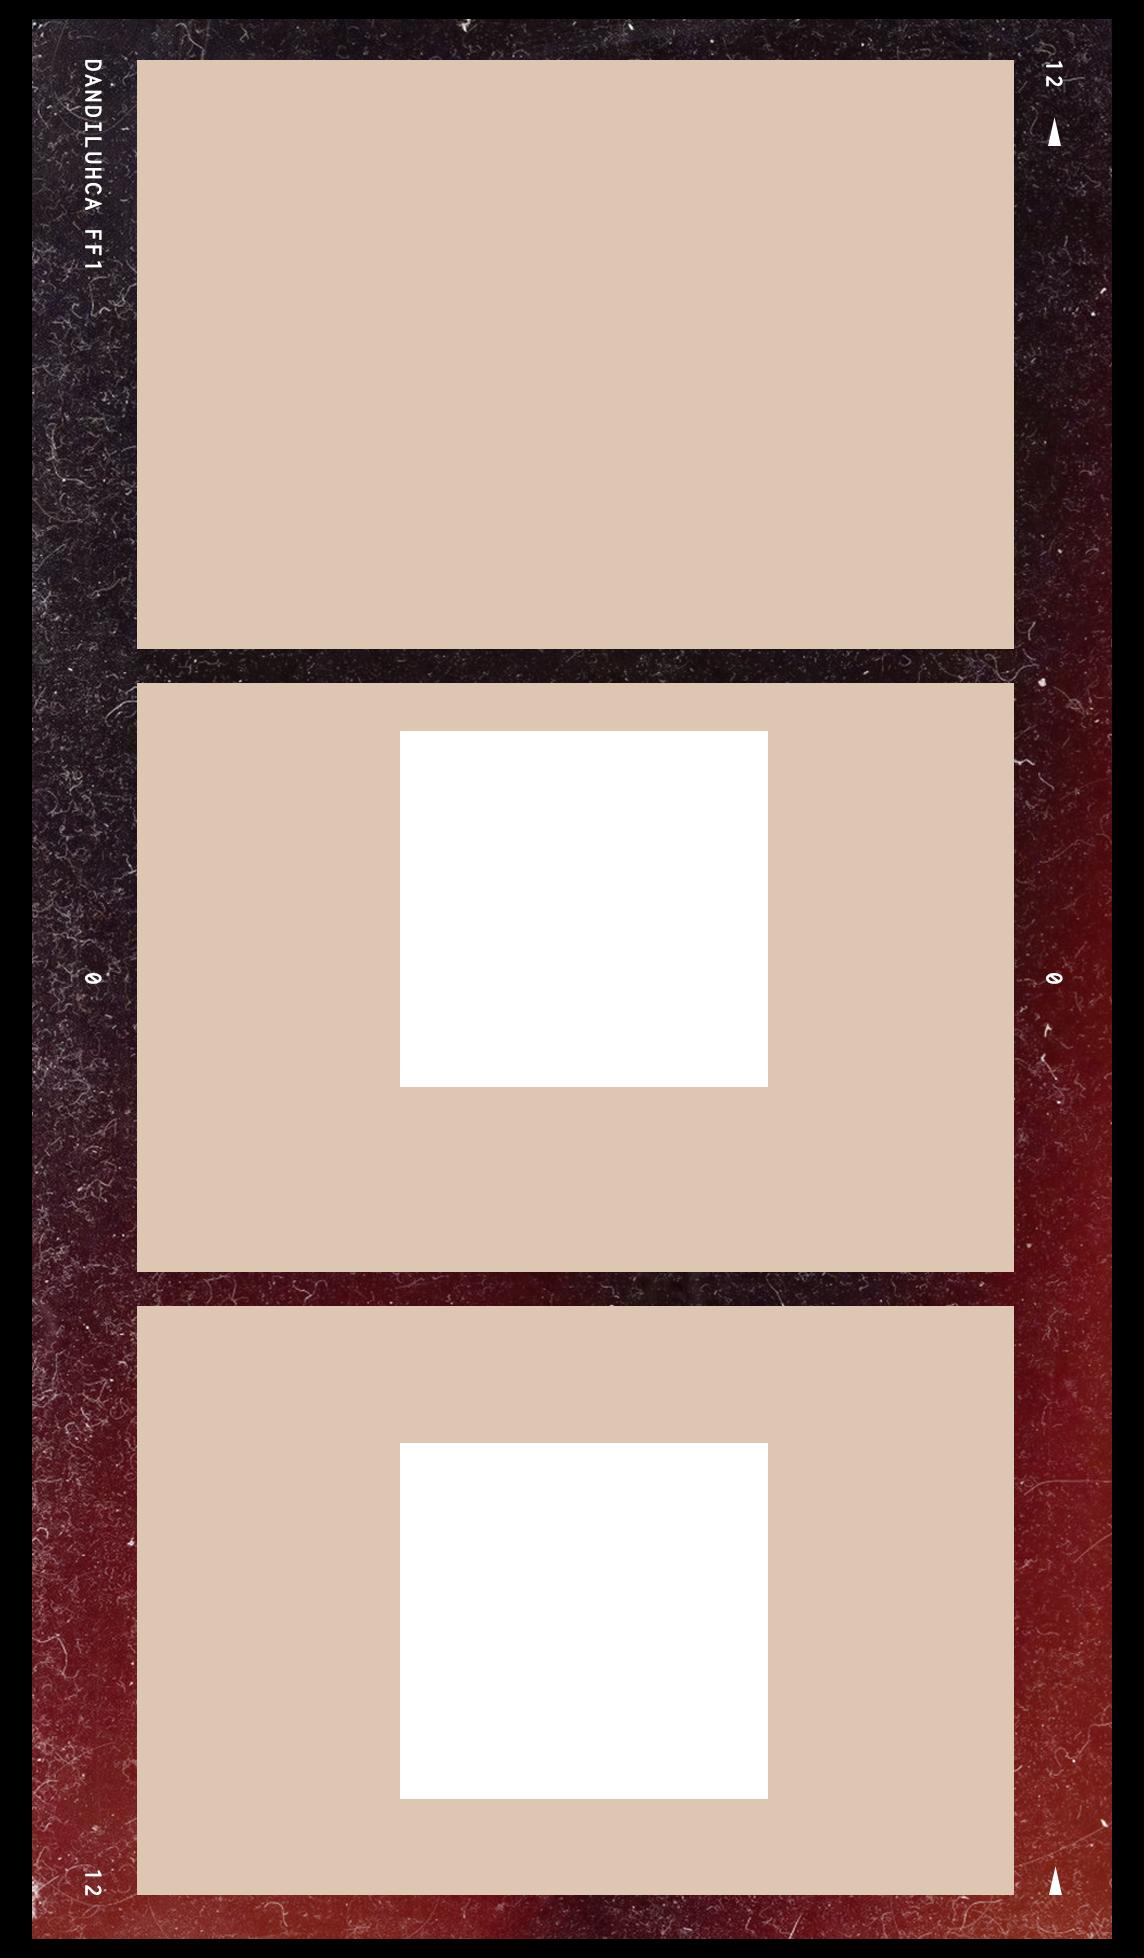 5abd317a5bc6316273094608 Png 564 652 Pixels Bingkai Foto Bingkai Bingkai Polaroid